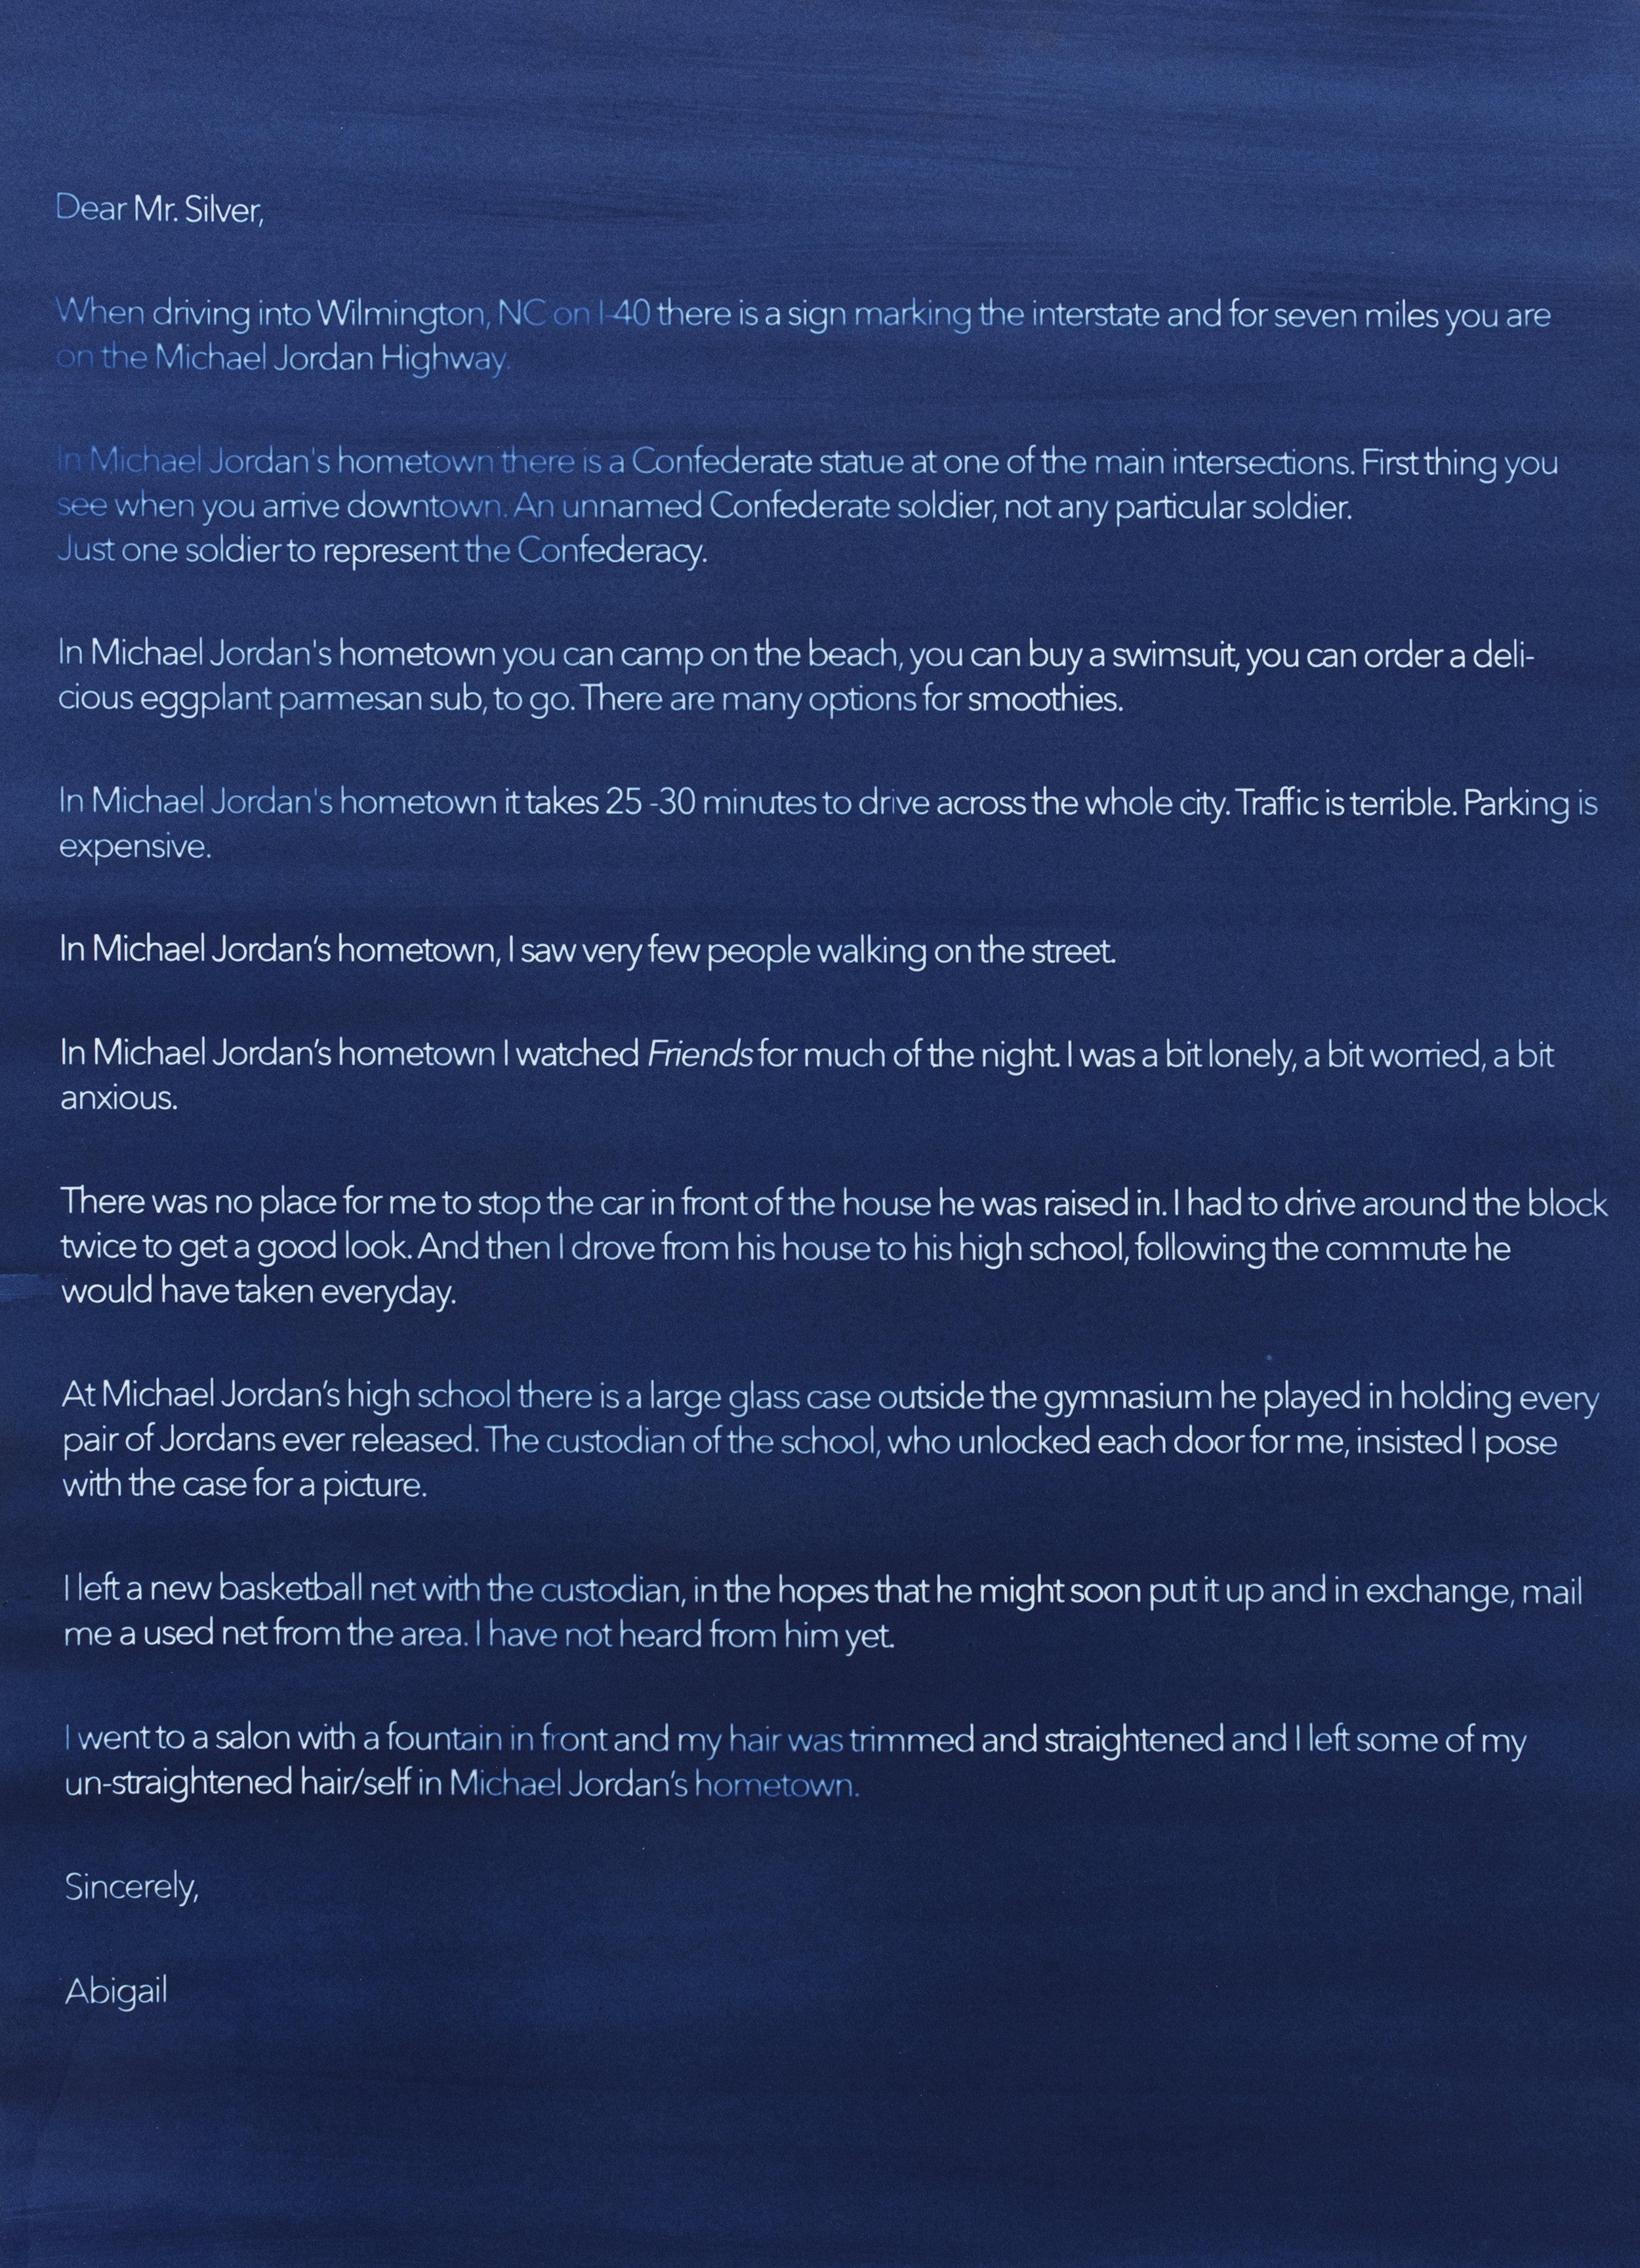 letter8 copycopy.jpg